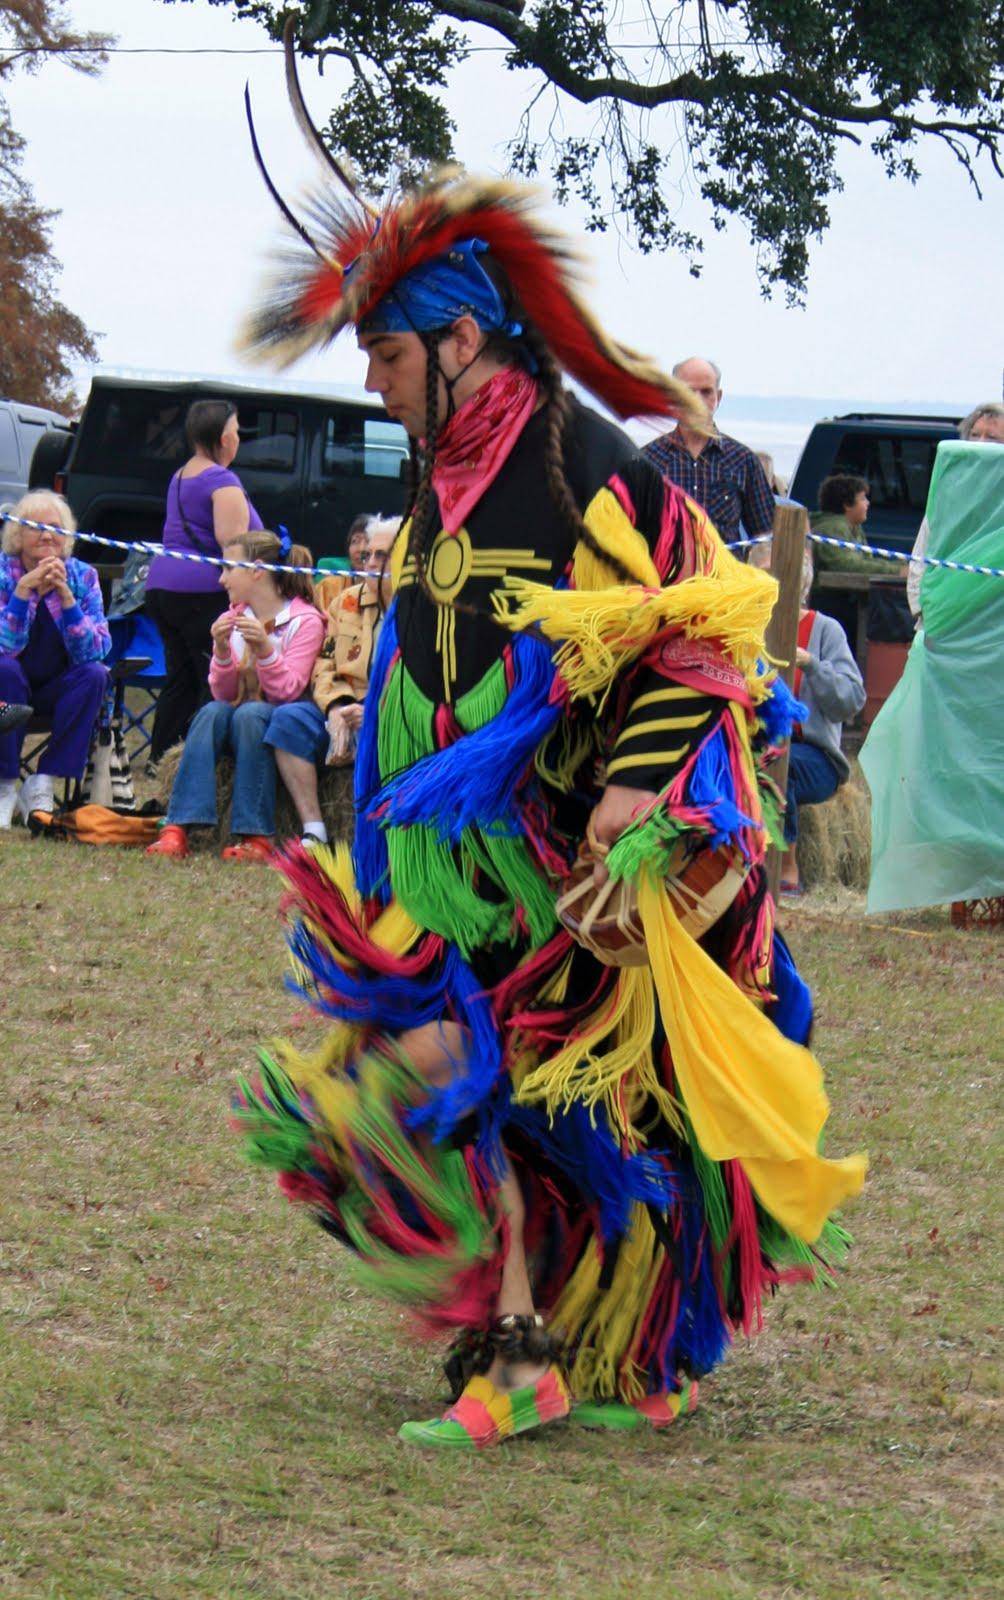 noviforever: Pow Wow - Pensacola Creek Indians